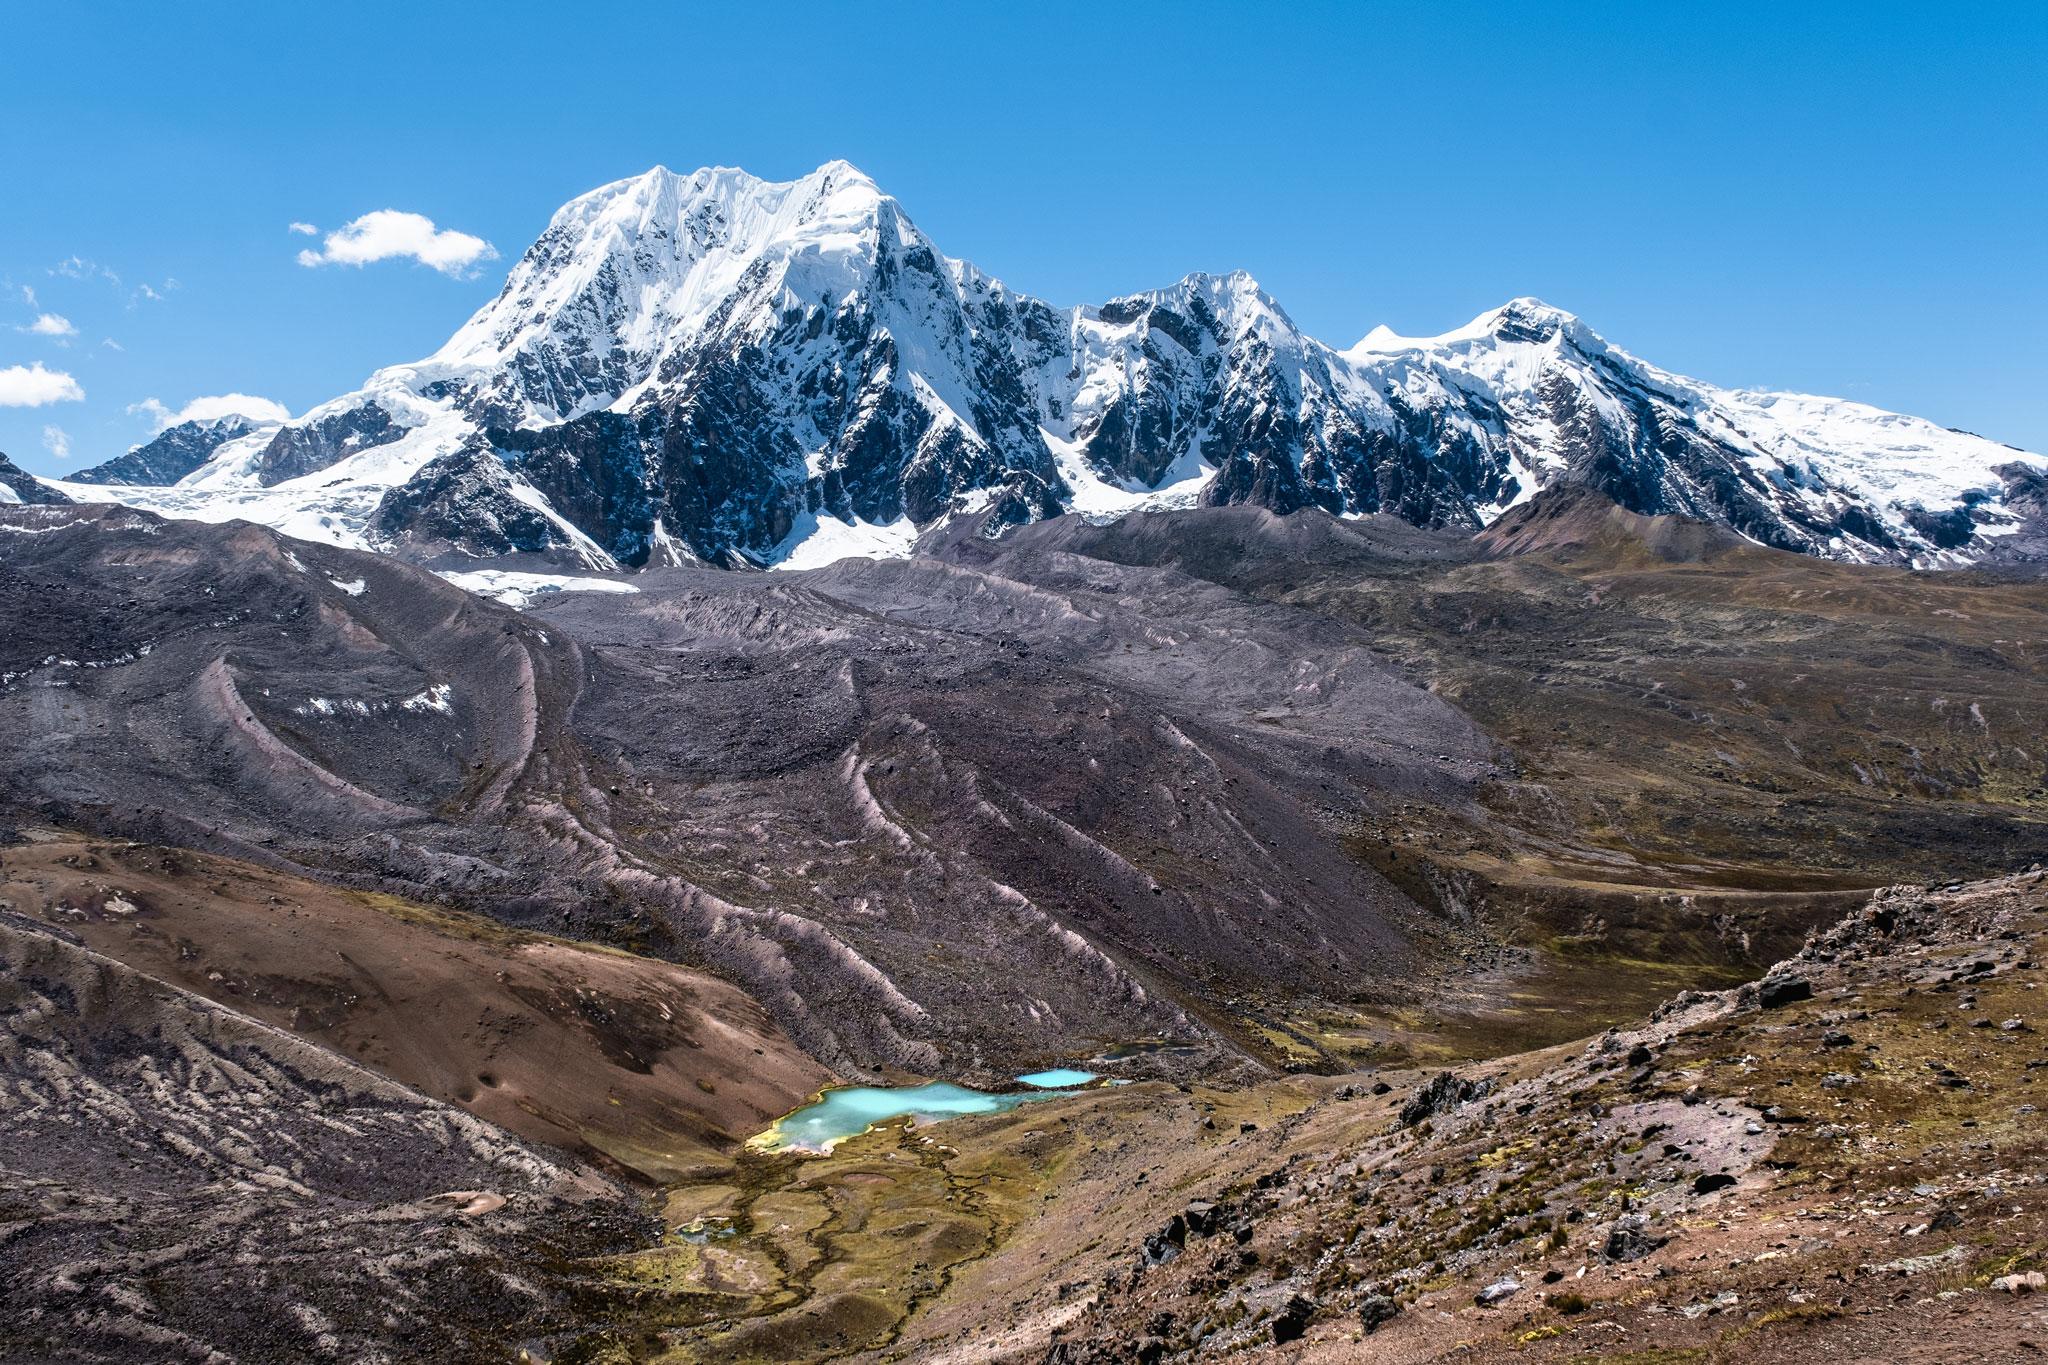 huayruro-punku-mountain-ausangate-peru